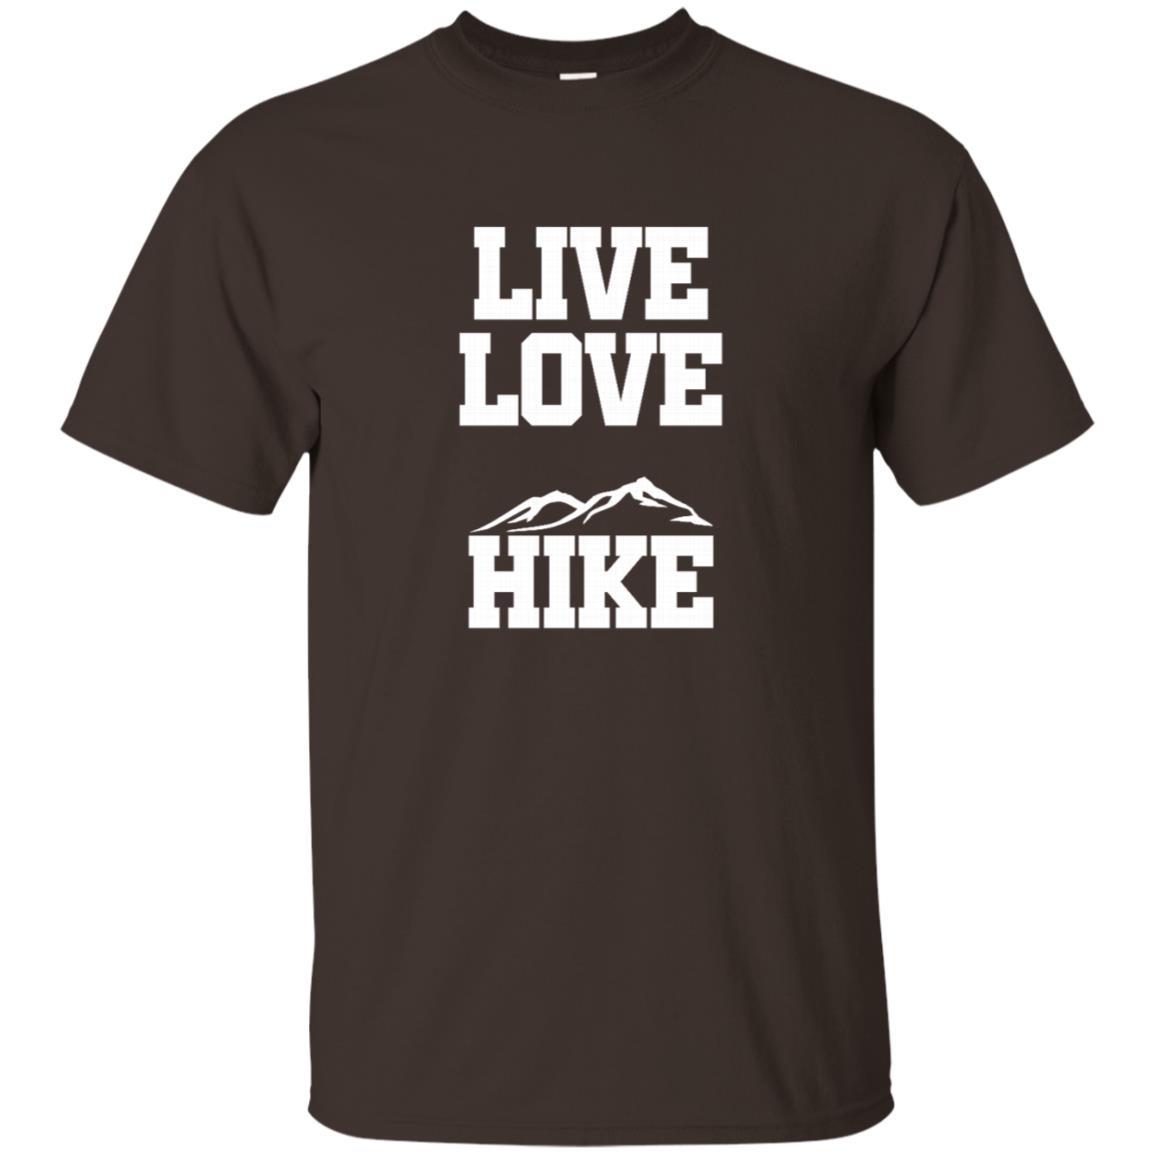 Live Love Hike – Mountain Climbing Unisex Short Sleeve